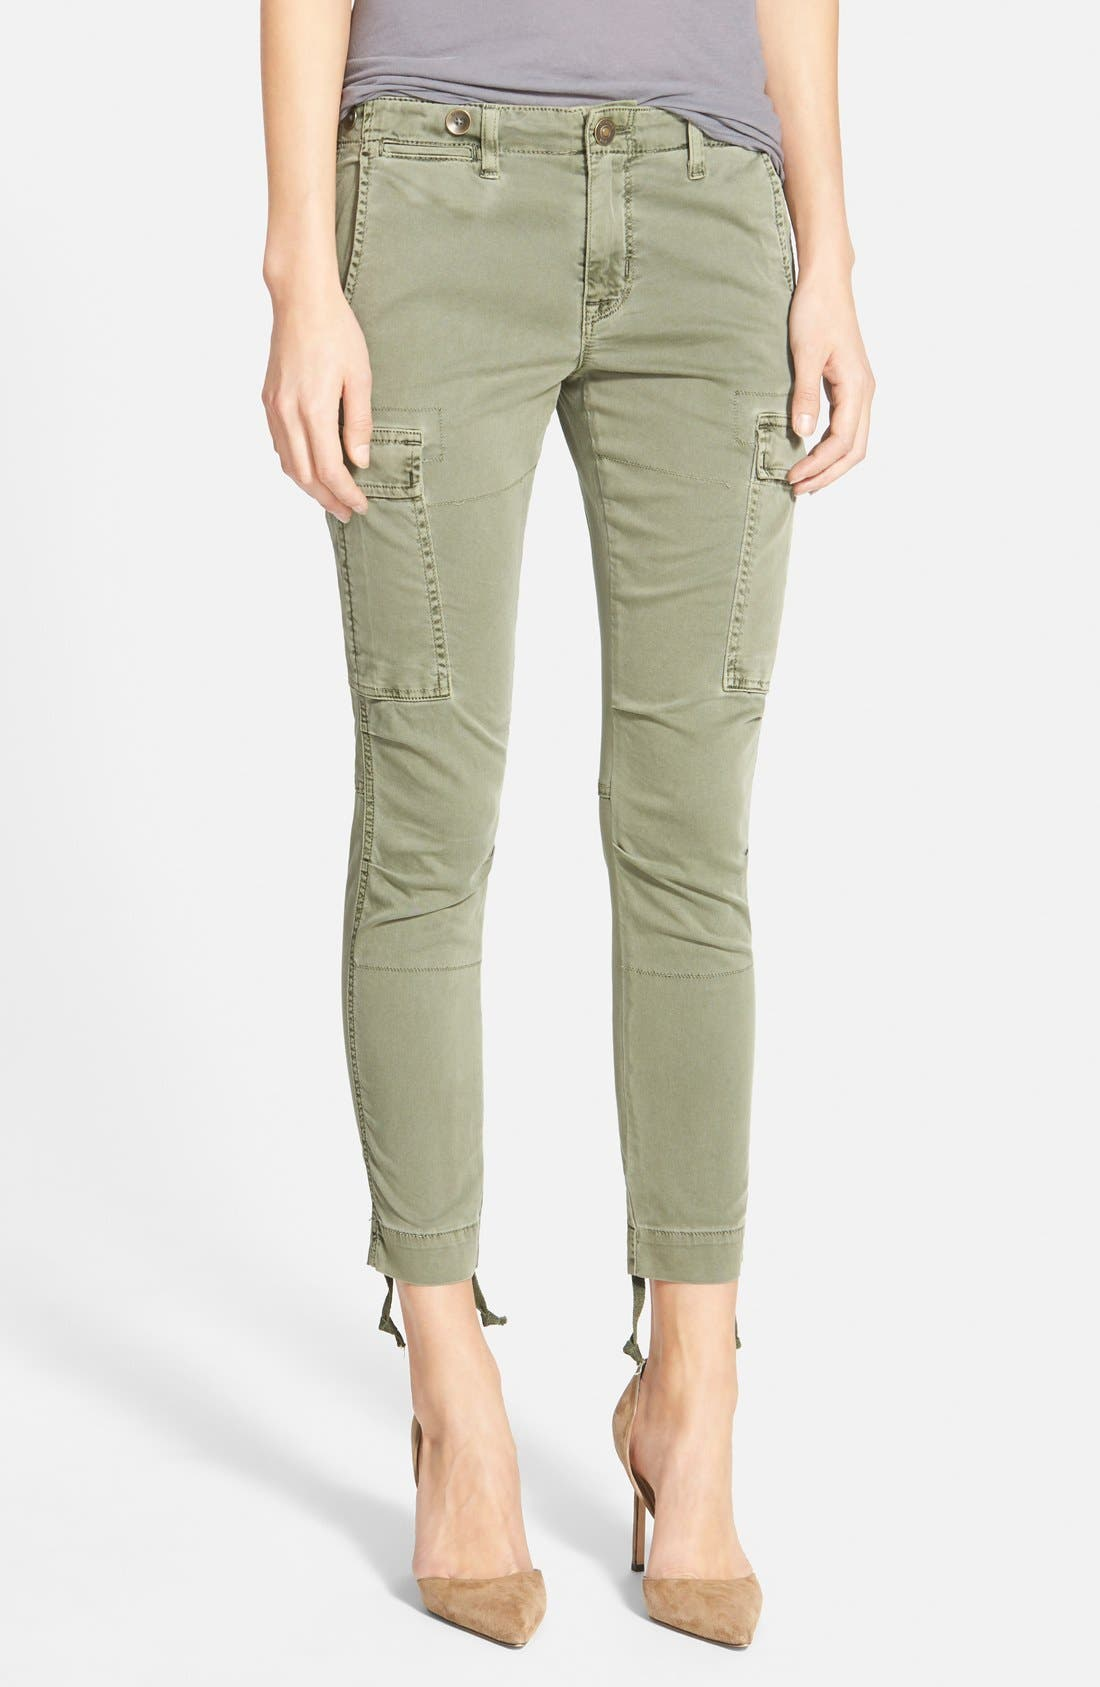 Alternate Image 1 Selected - Hudson Jeans 'Rowan' Slouchy Cargo Pants